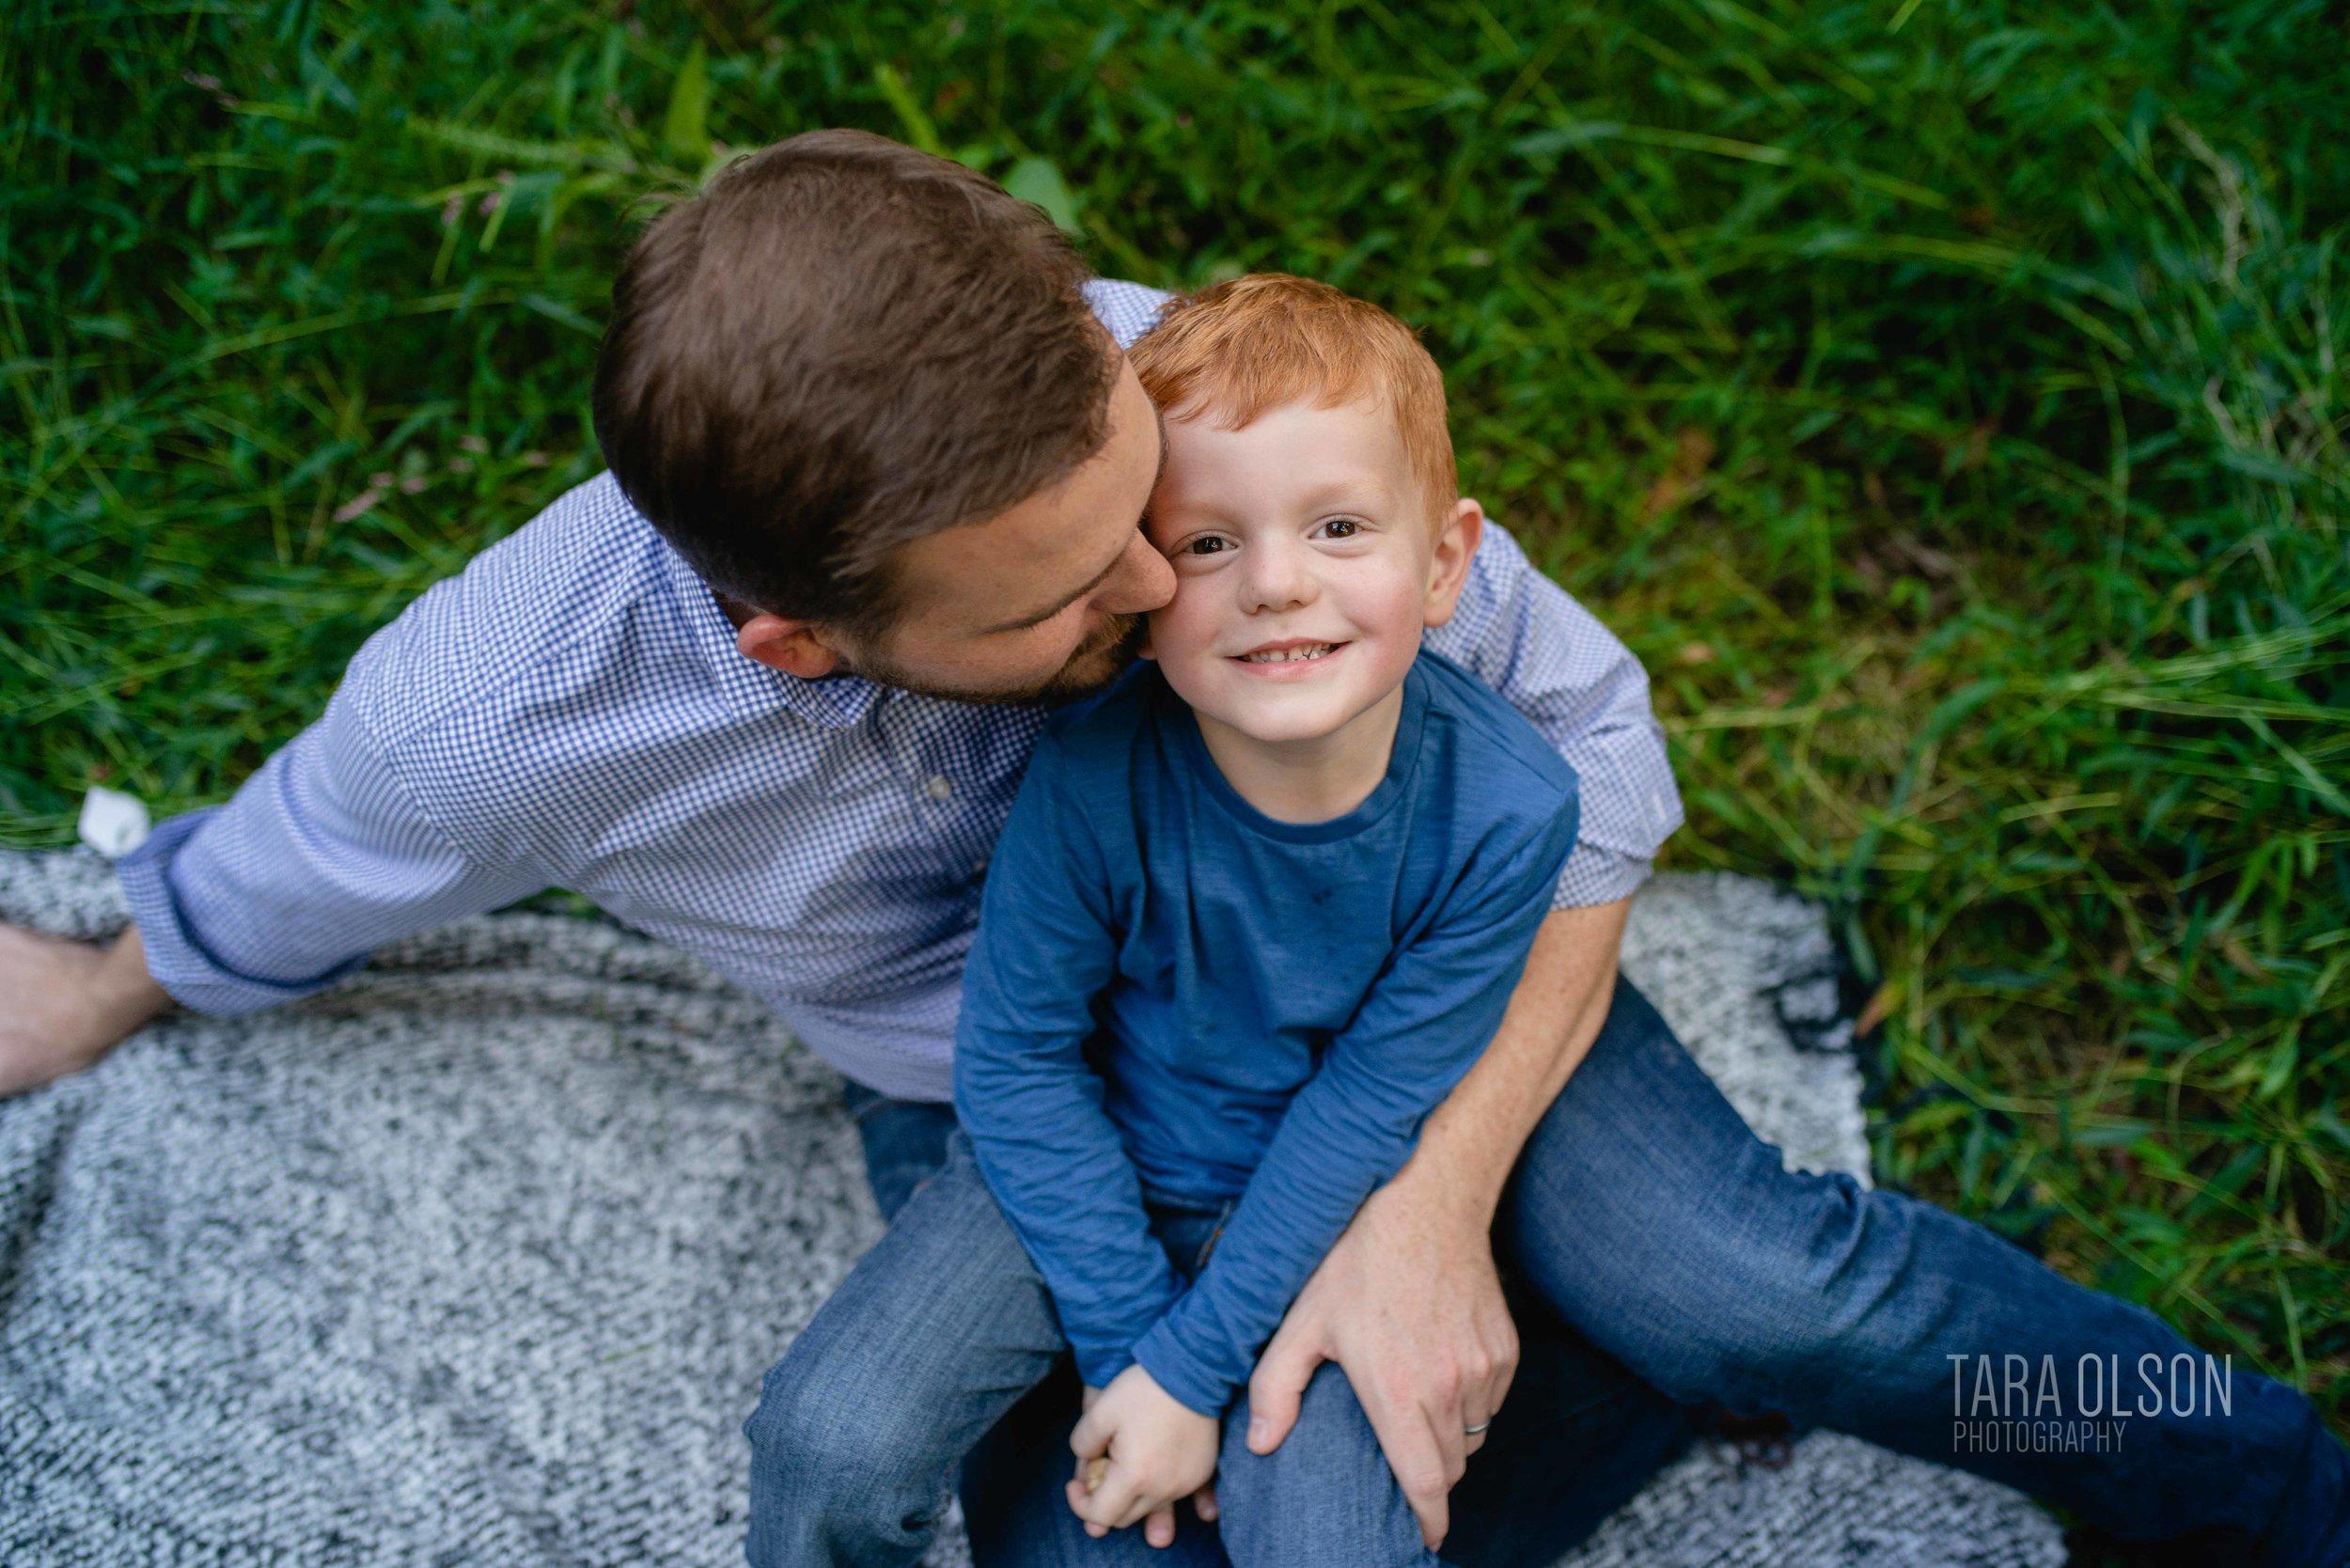 Hawkins_Arlington-Virginia-Family-Photographer_Tara-Olson-Photography_4170.jpg